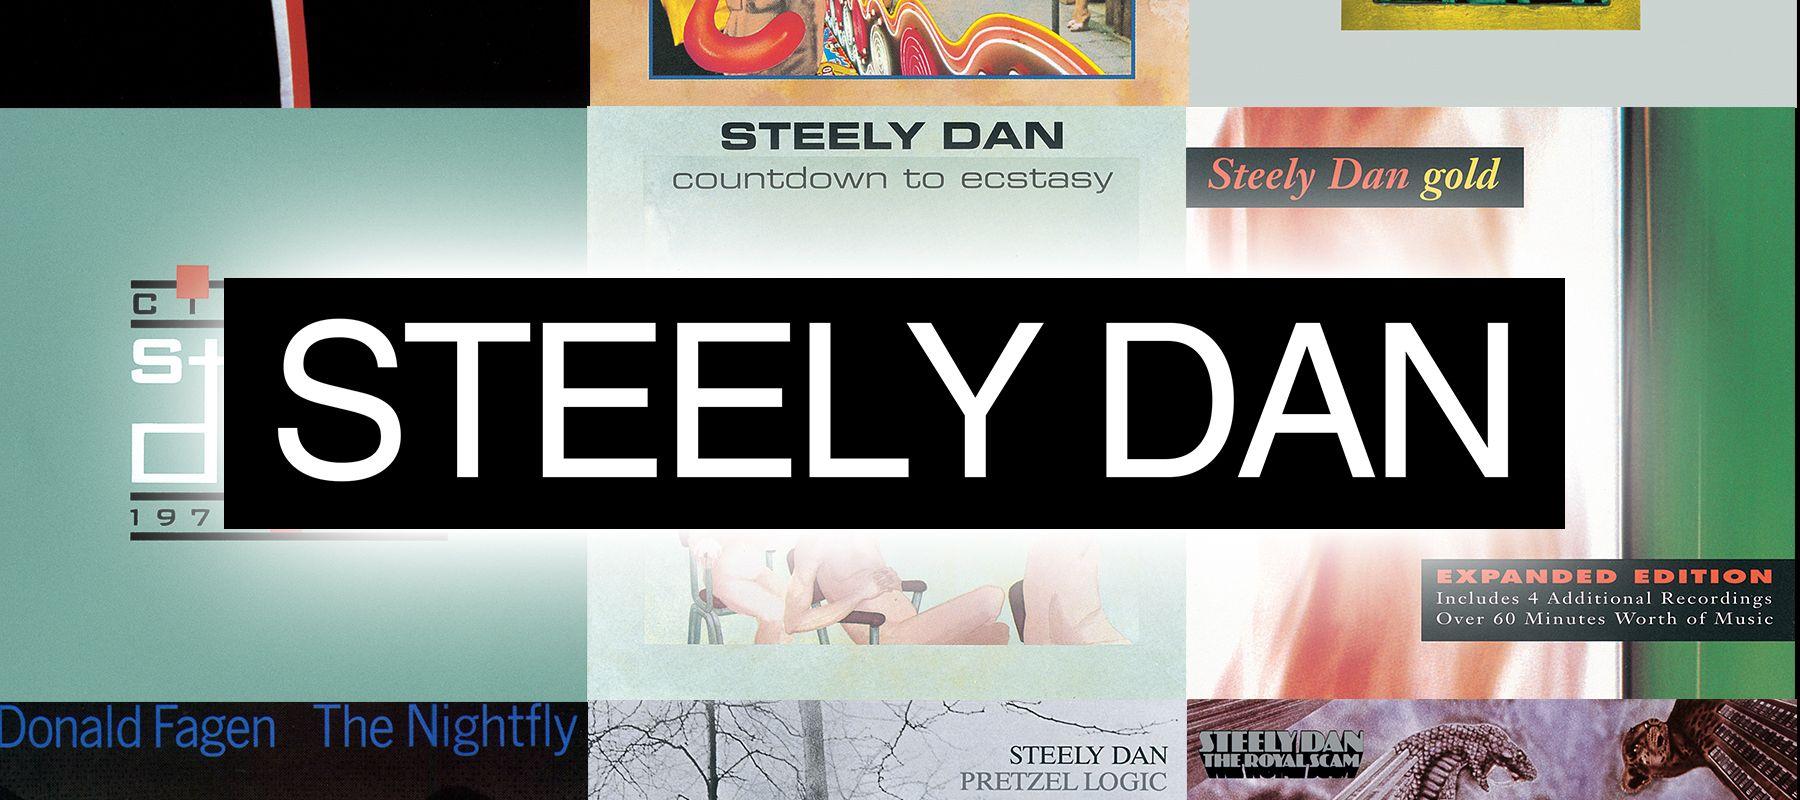 steelydan_web_spot.jpg